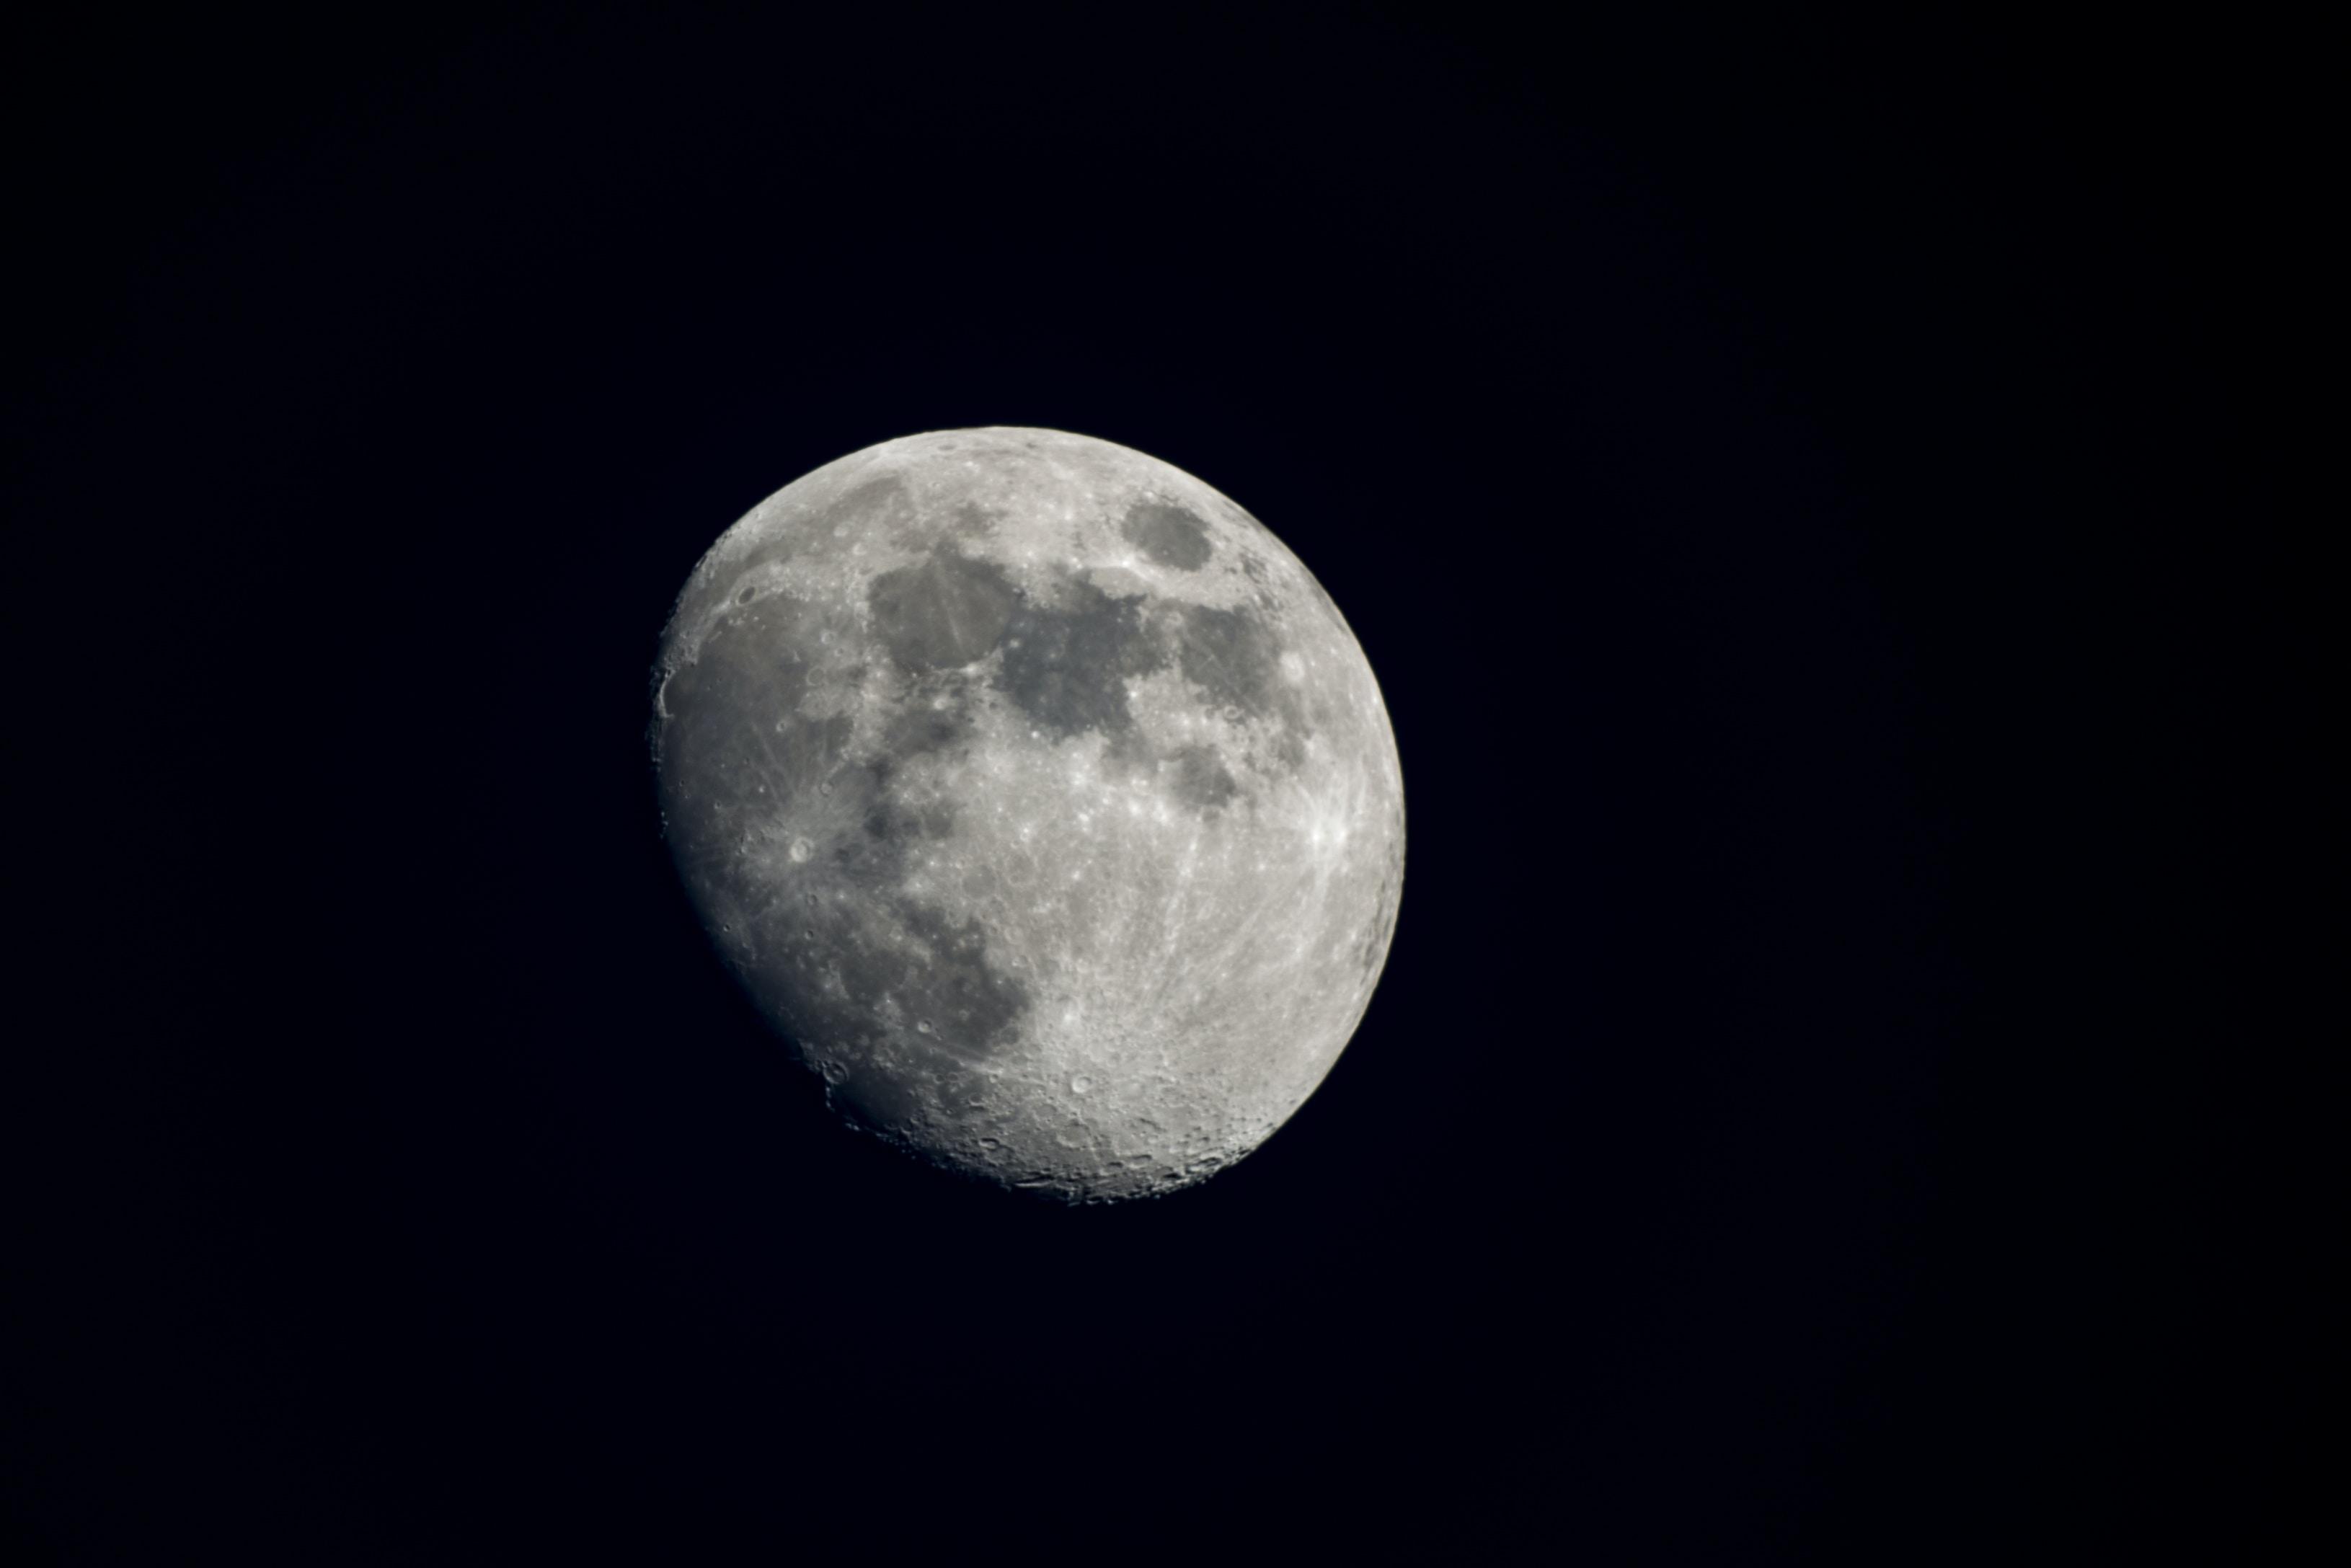 quarter moon in night sky